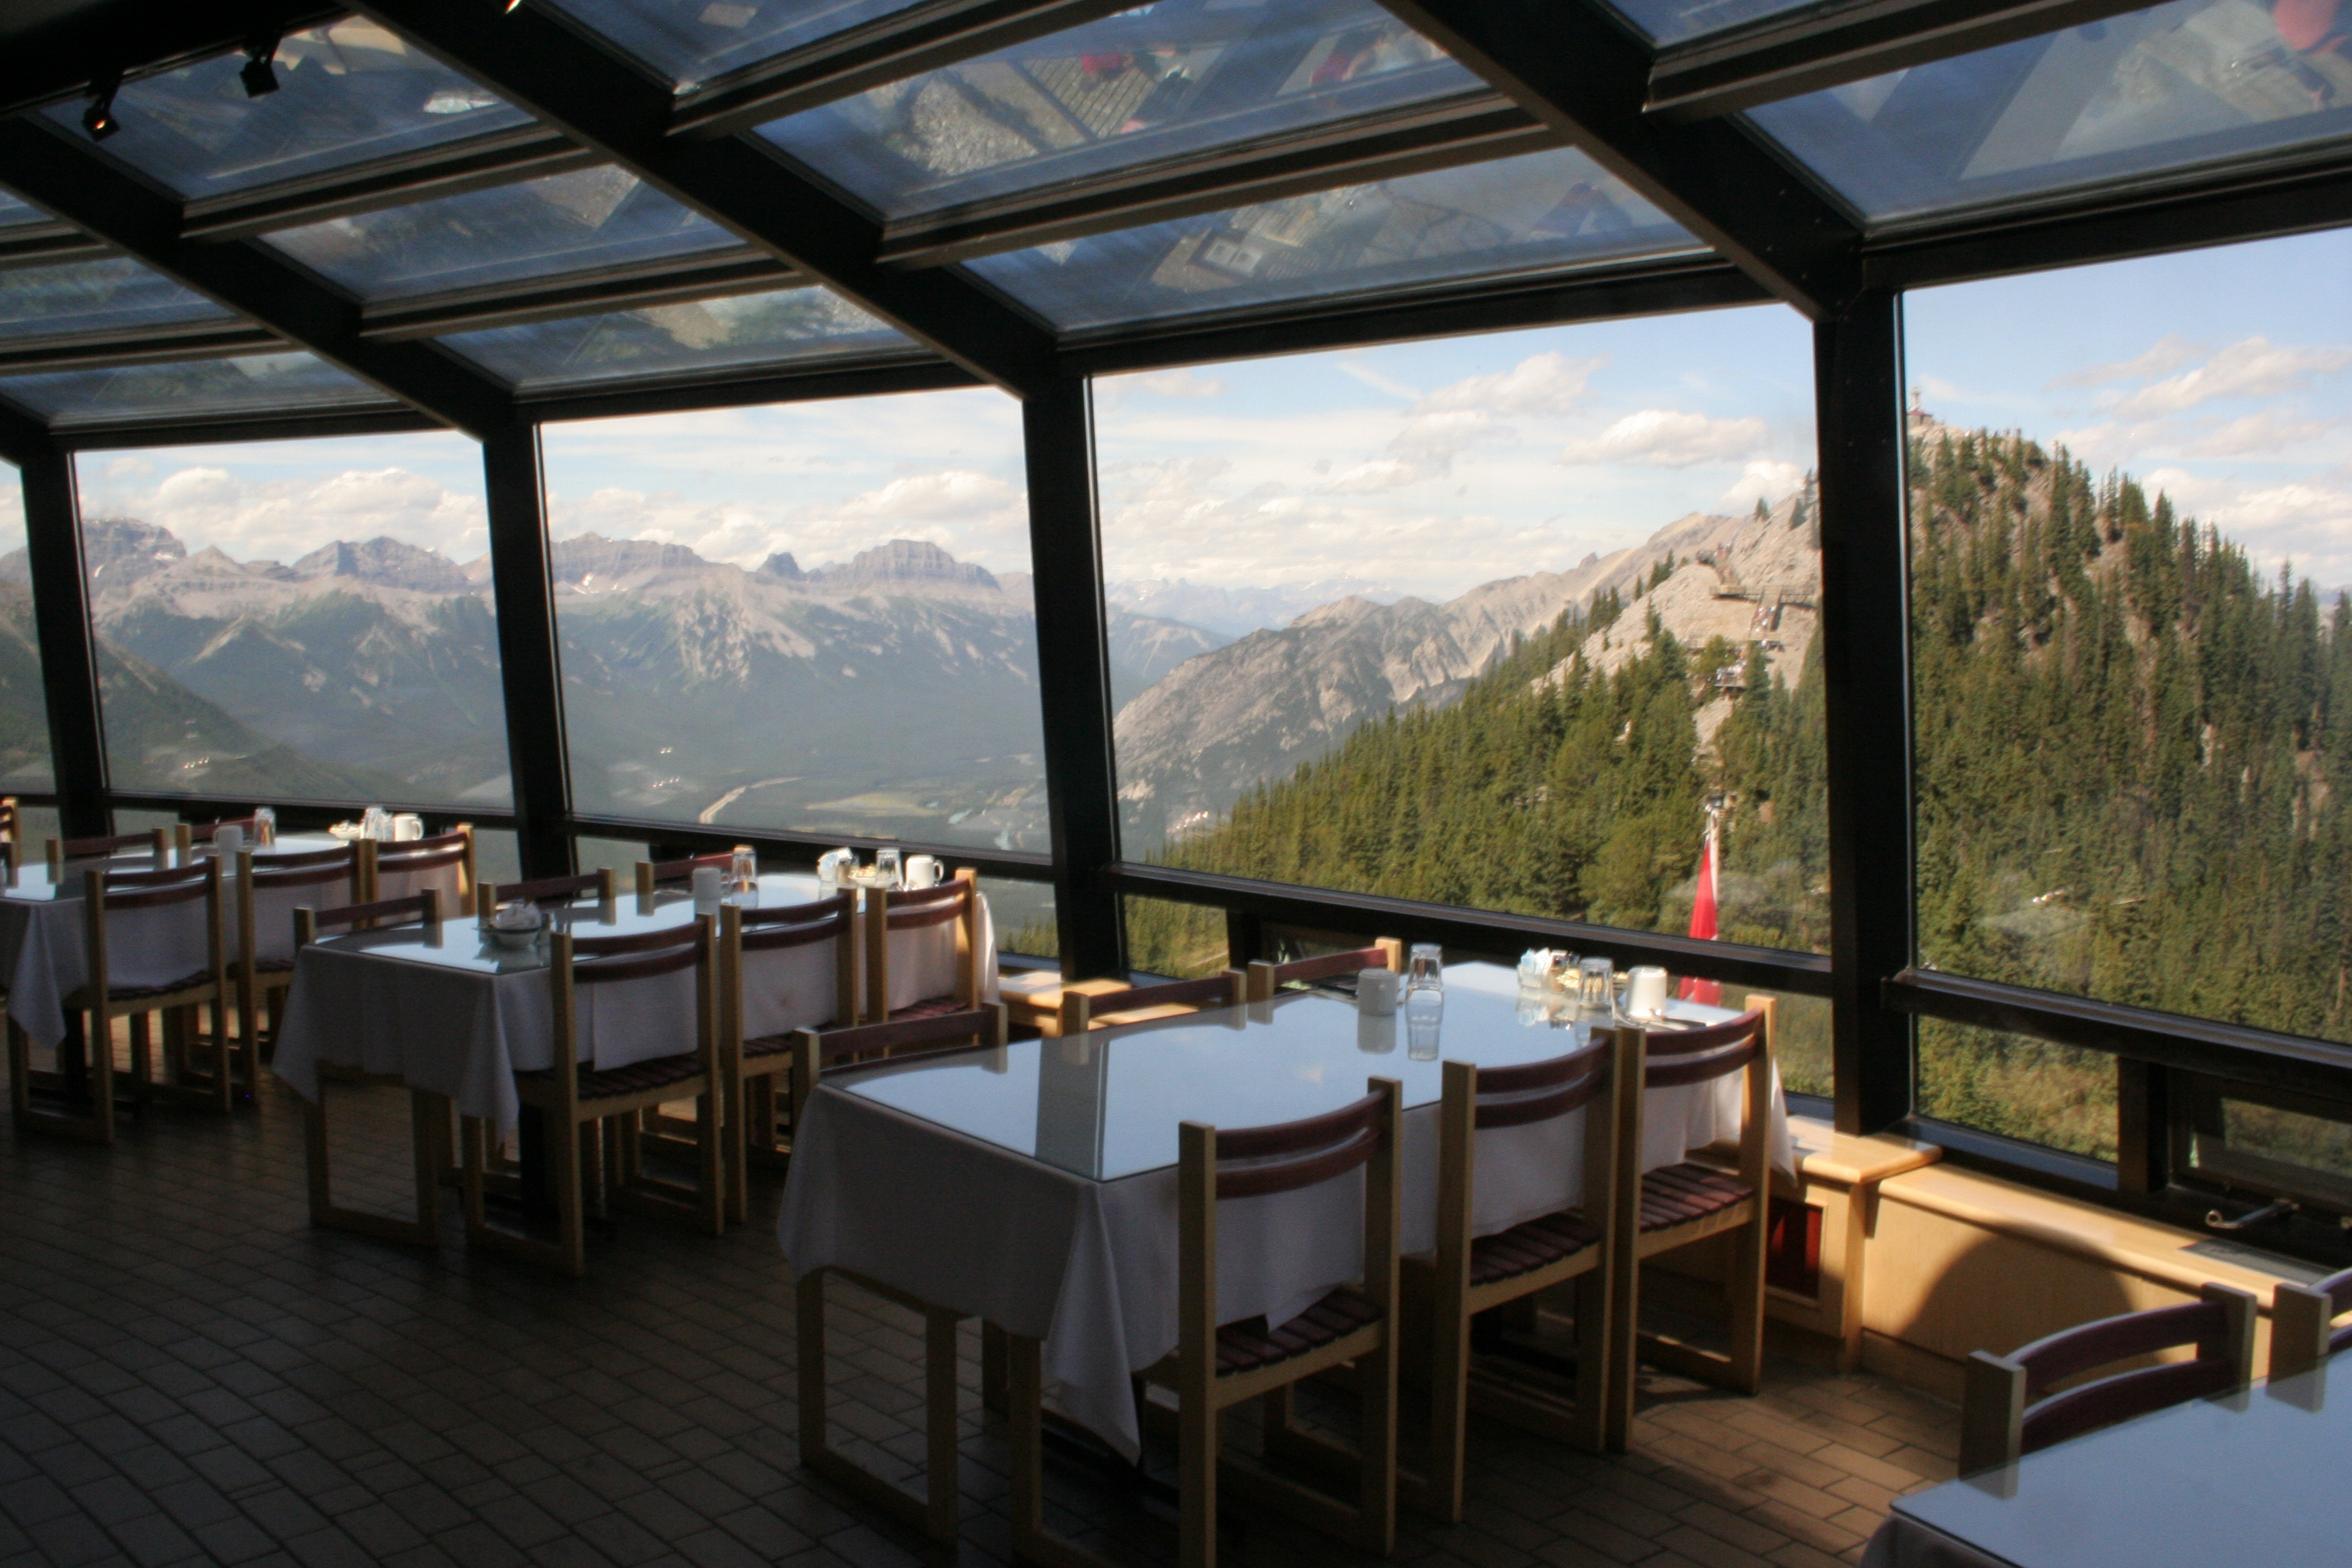 Best Italian Restaurant In Pismo Beach